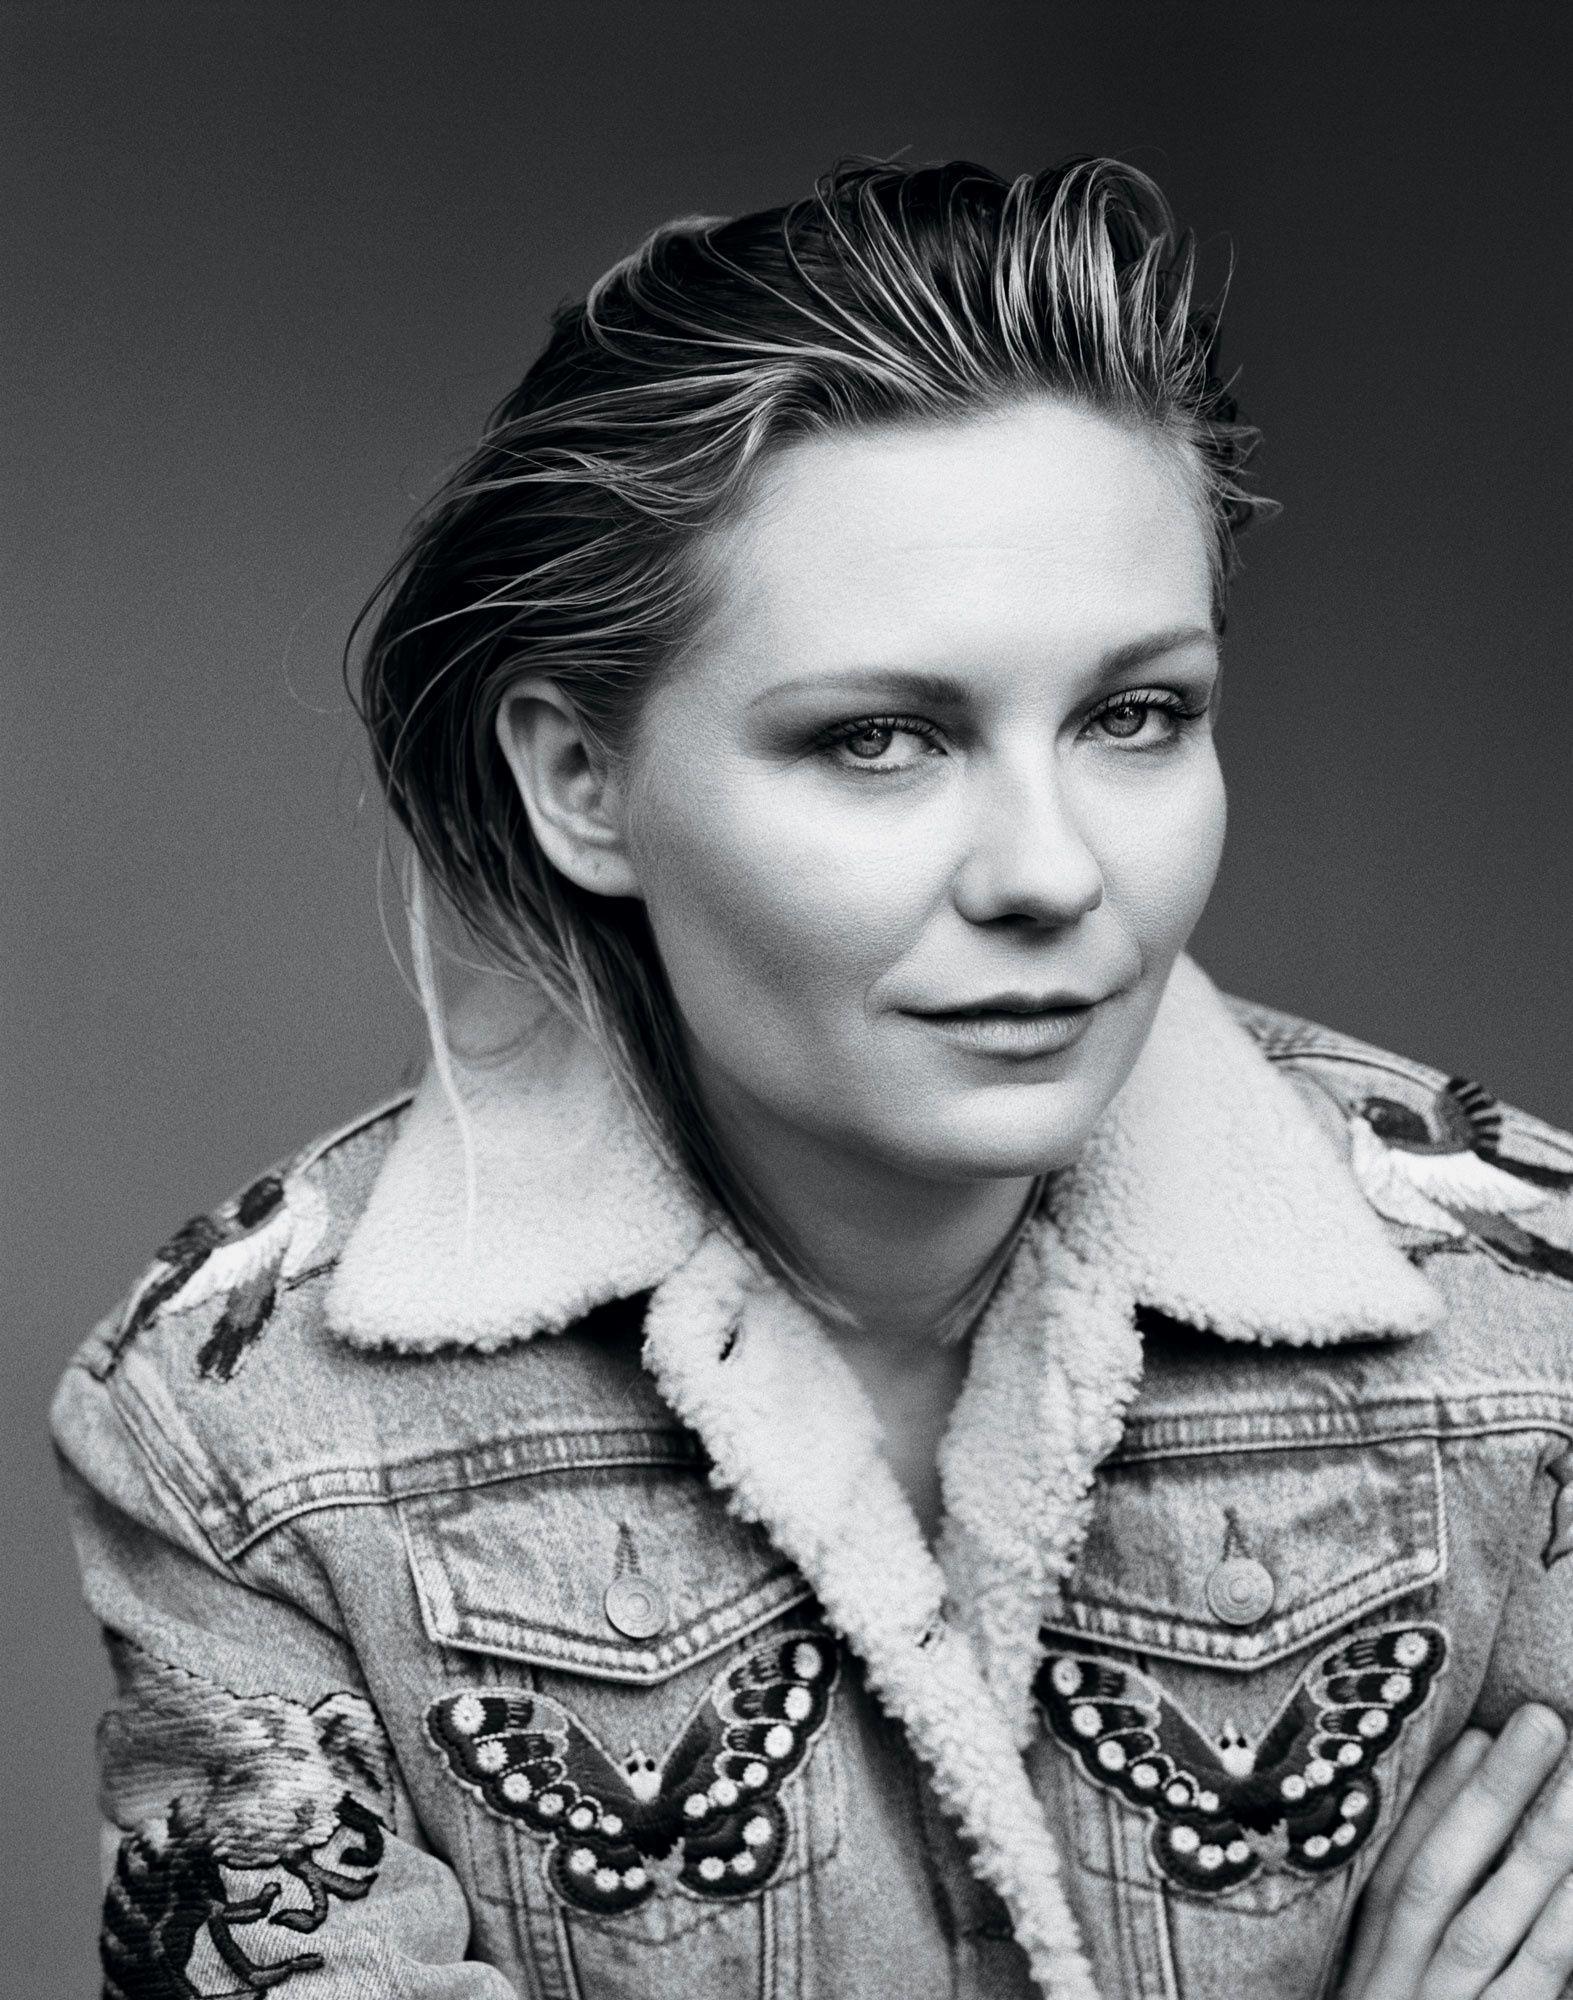 Black and white portrait of Kirsten Dunst in denim jacket.